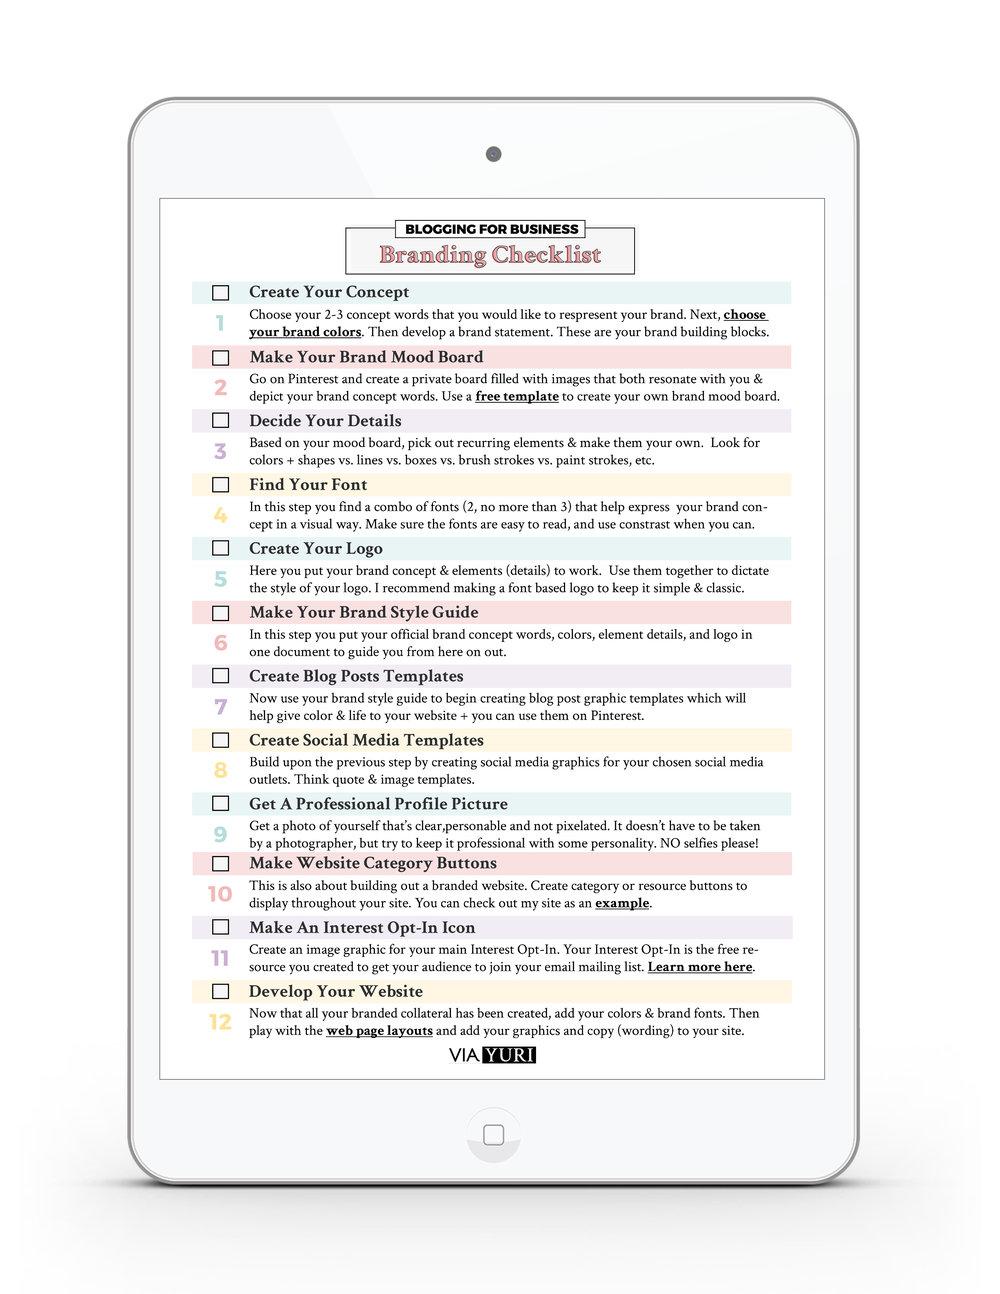 Brand Your Business Checklist -